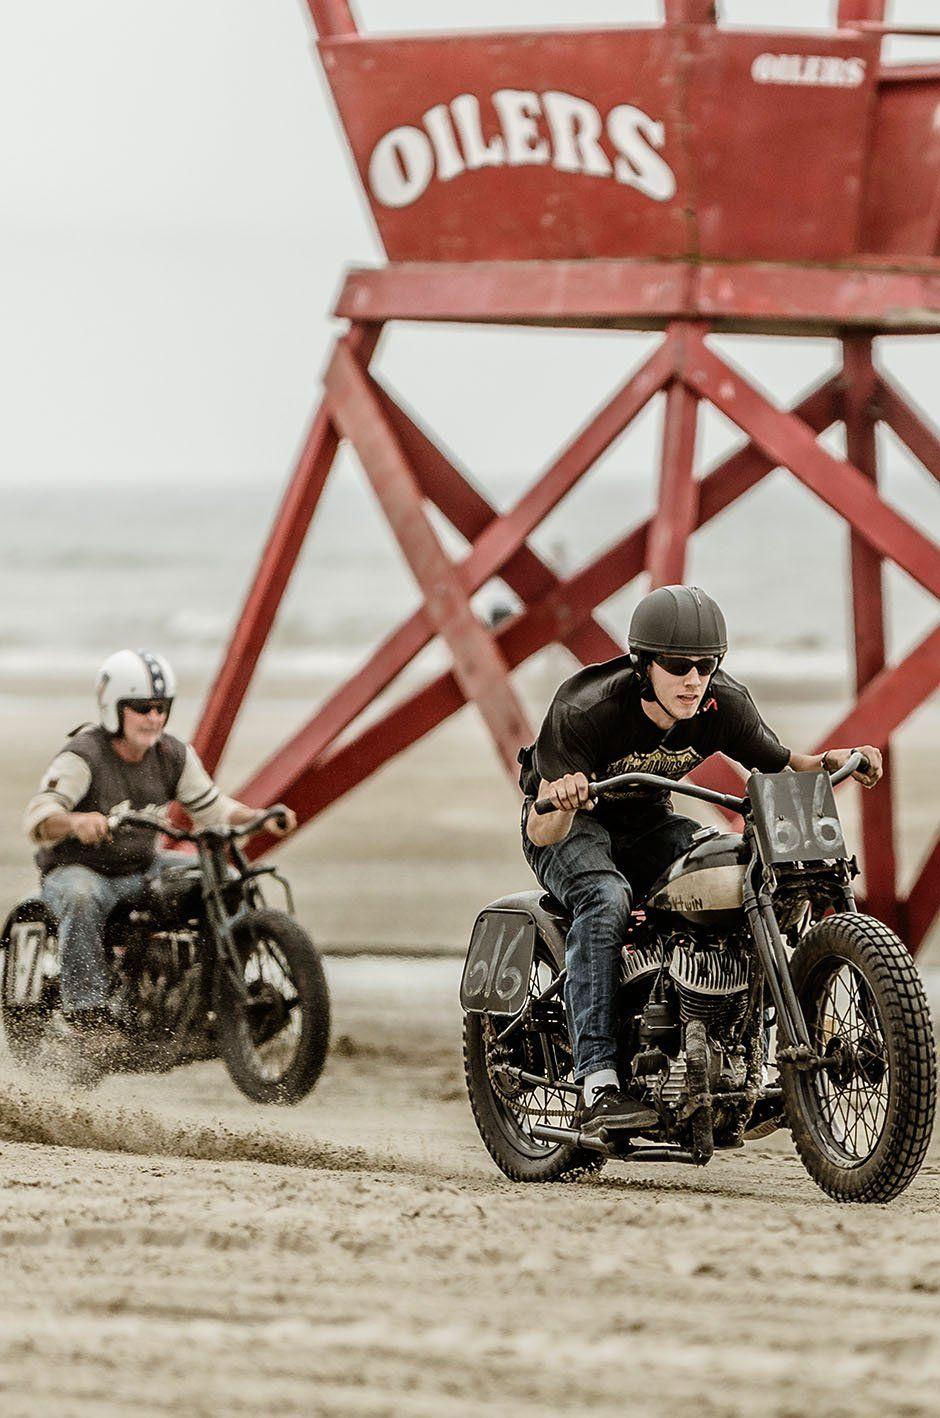 Hot Rod Motorcycle Motorbike Cafe Racer Biker Retro Motorsport Racing Vintage 3